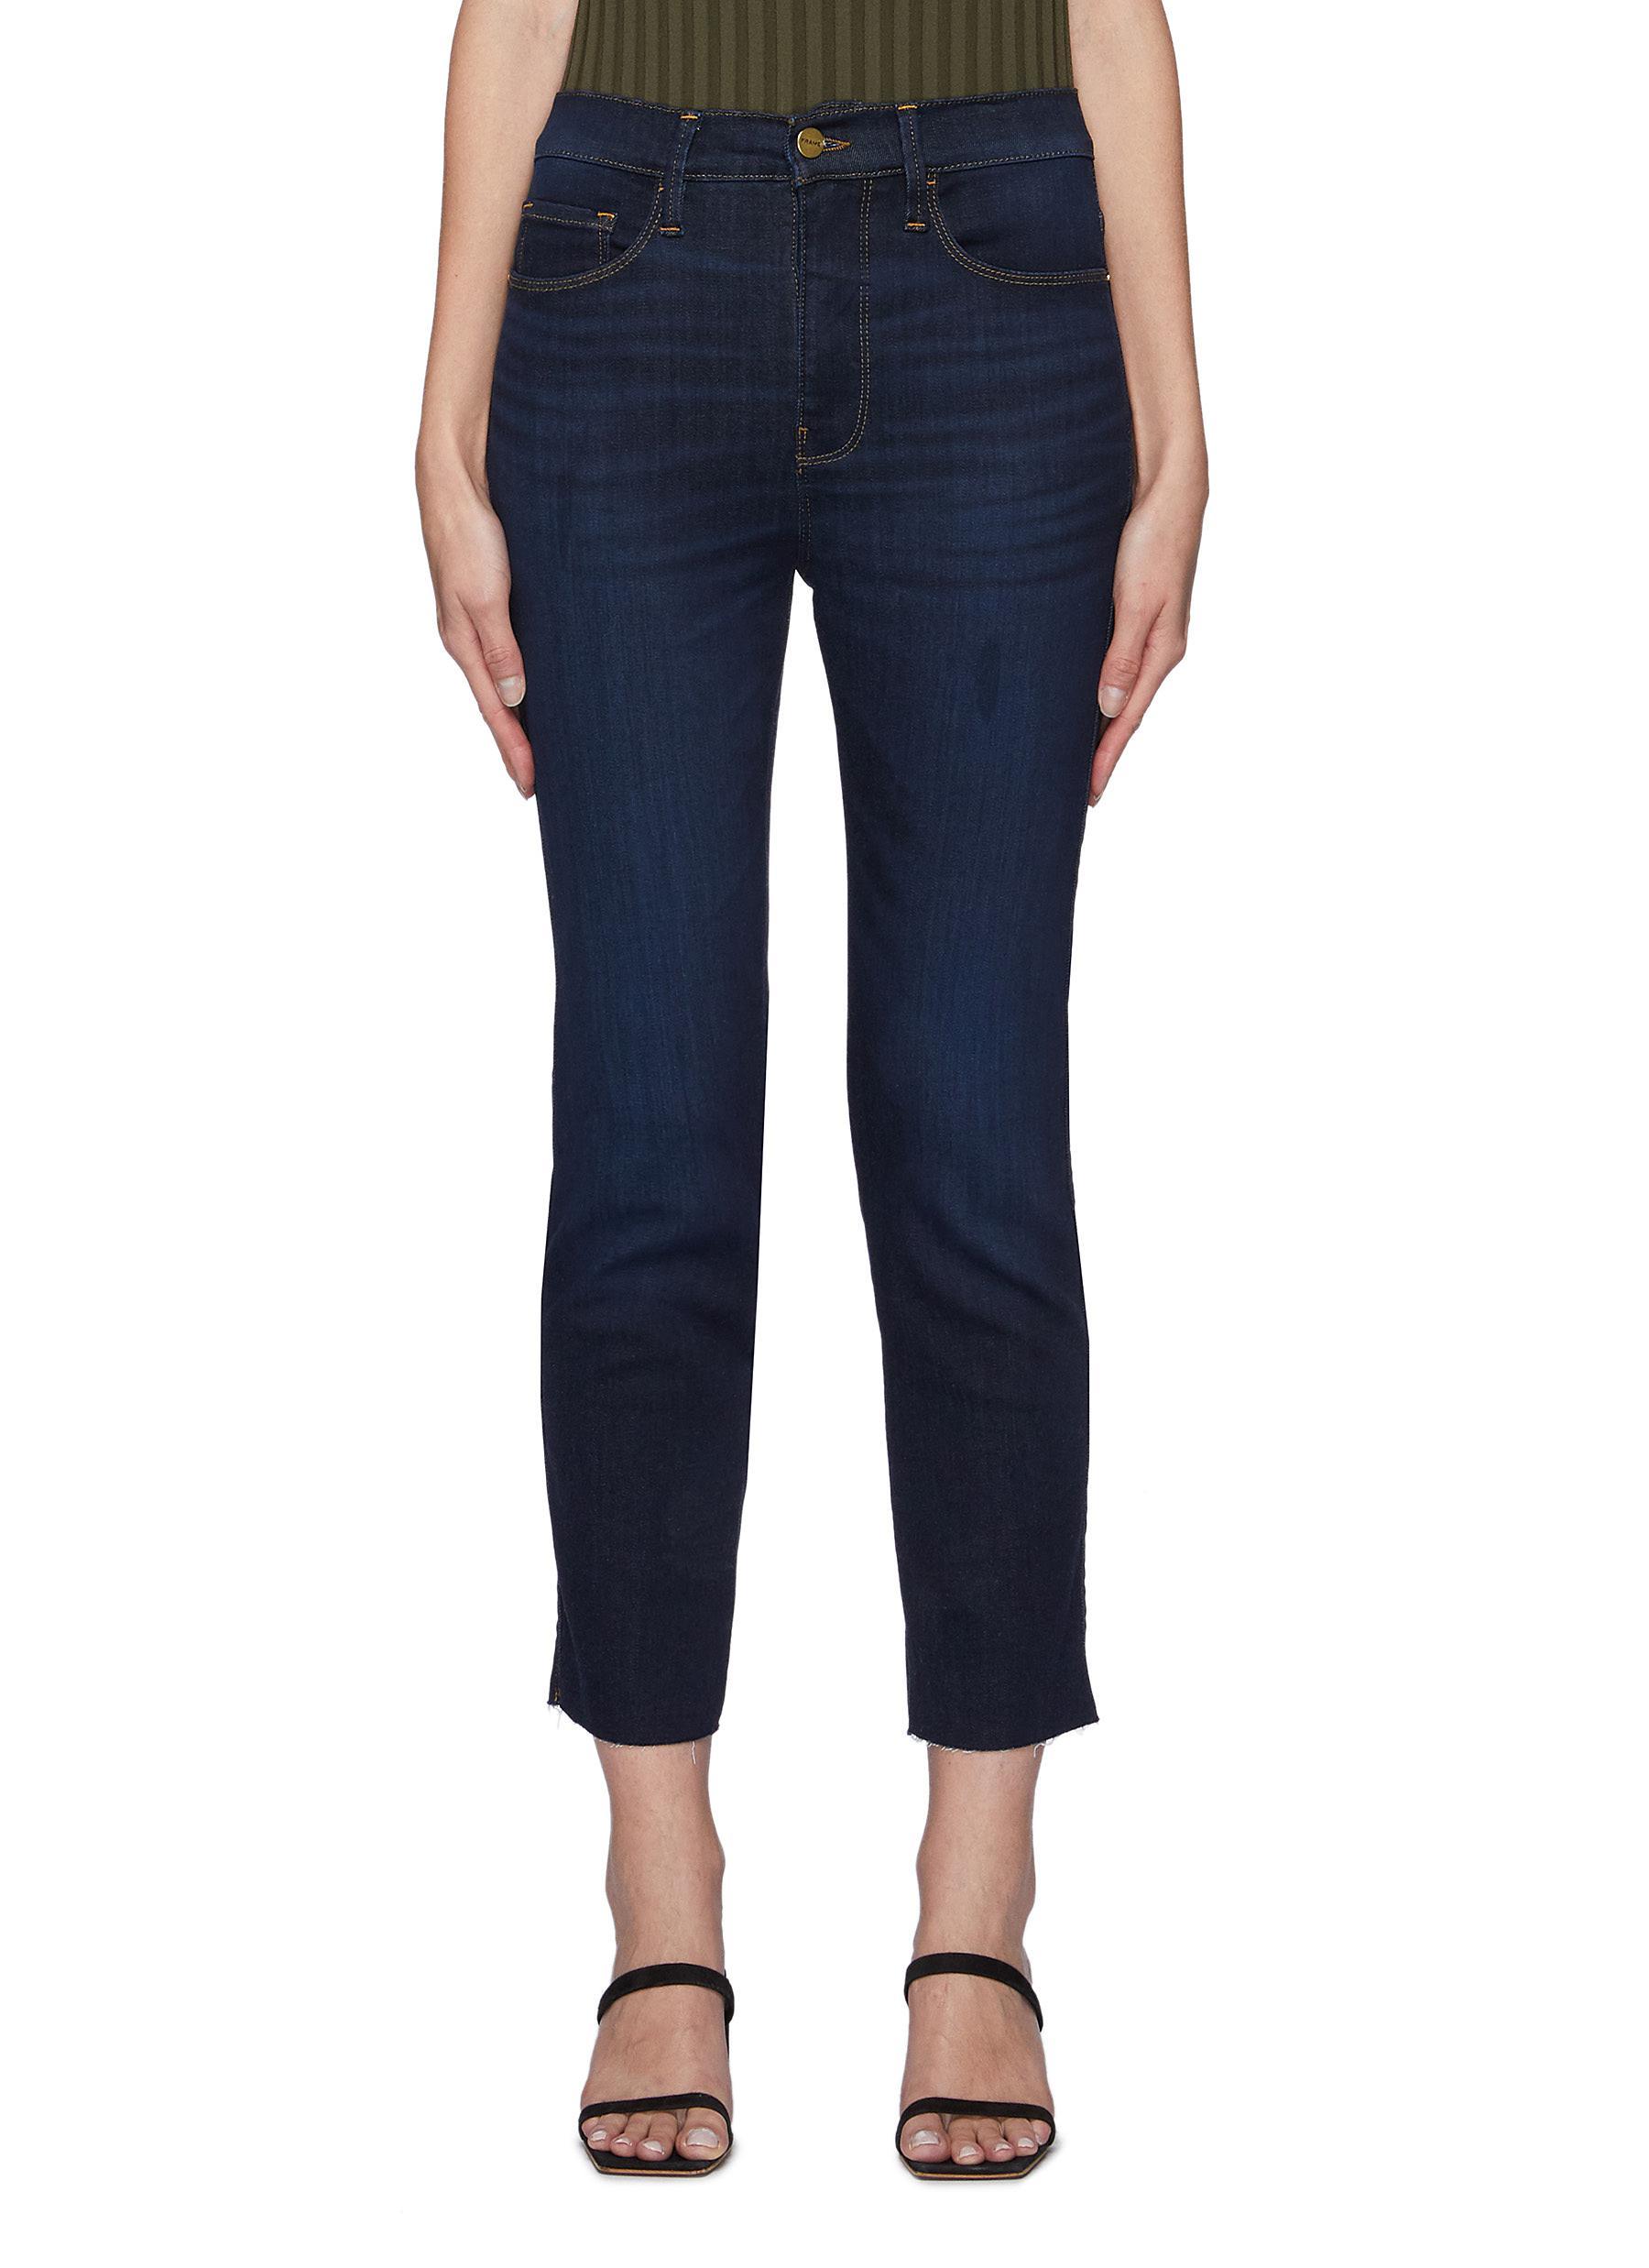 Le Pize Silvie Raw After Dark Indigo Wash Slim Straight Jeans